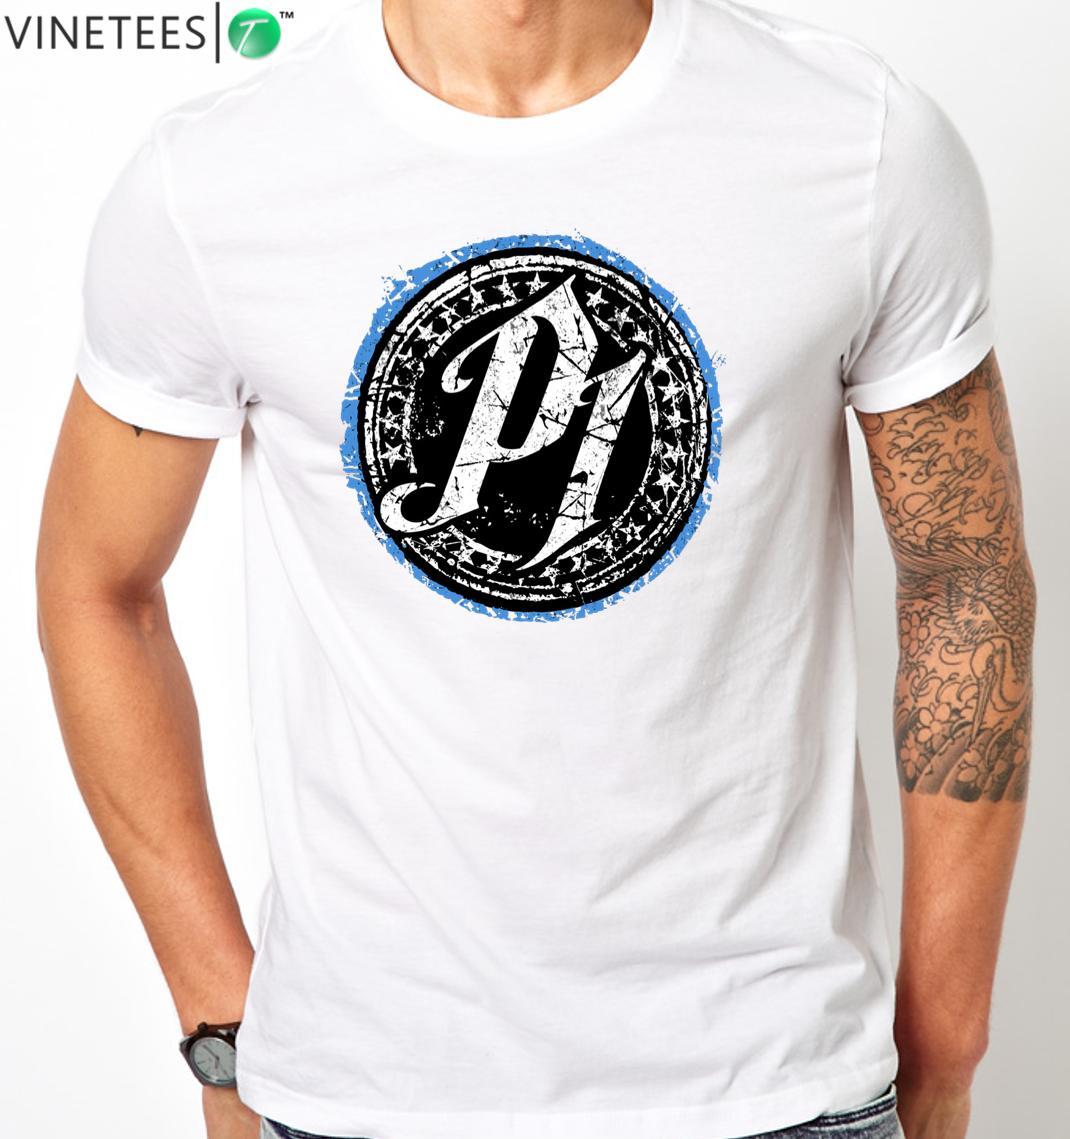 bbe11da7d9303 AJ Styles The Phenomenal One Bullet Club John Cena T Shirt MENS KIDS Size  Buy T Shirt Fun Shirt From Boystshirts55